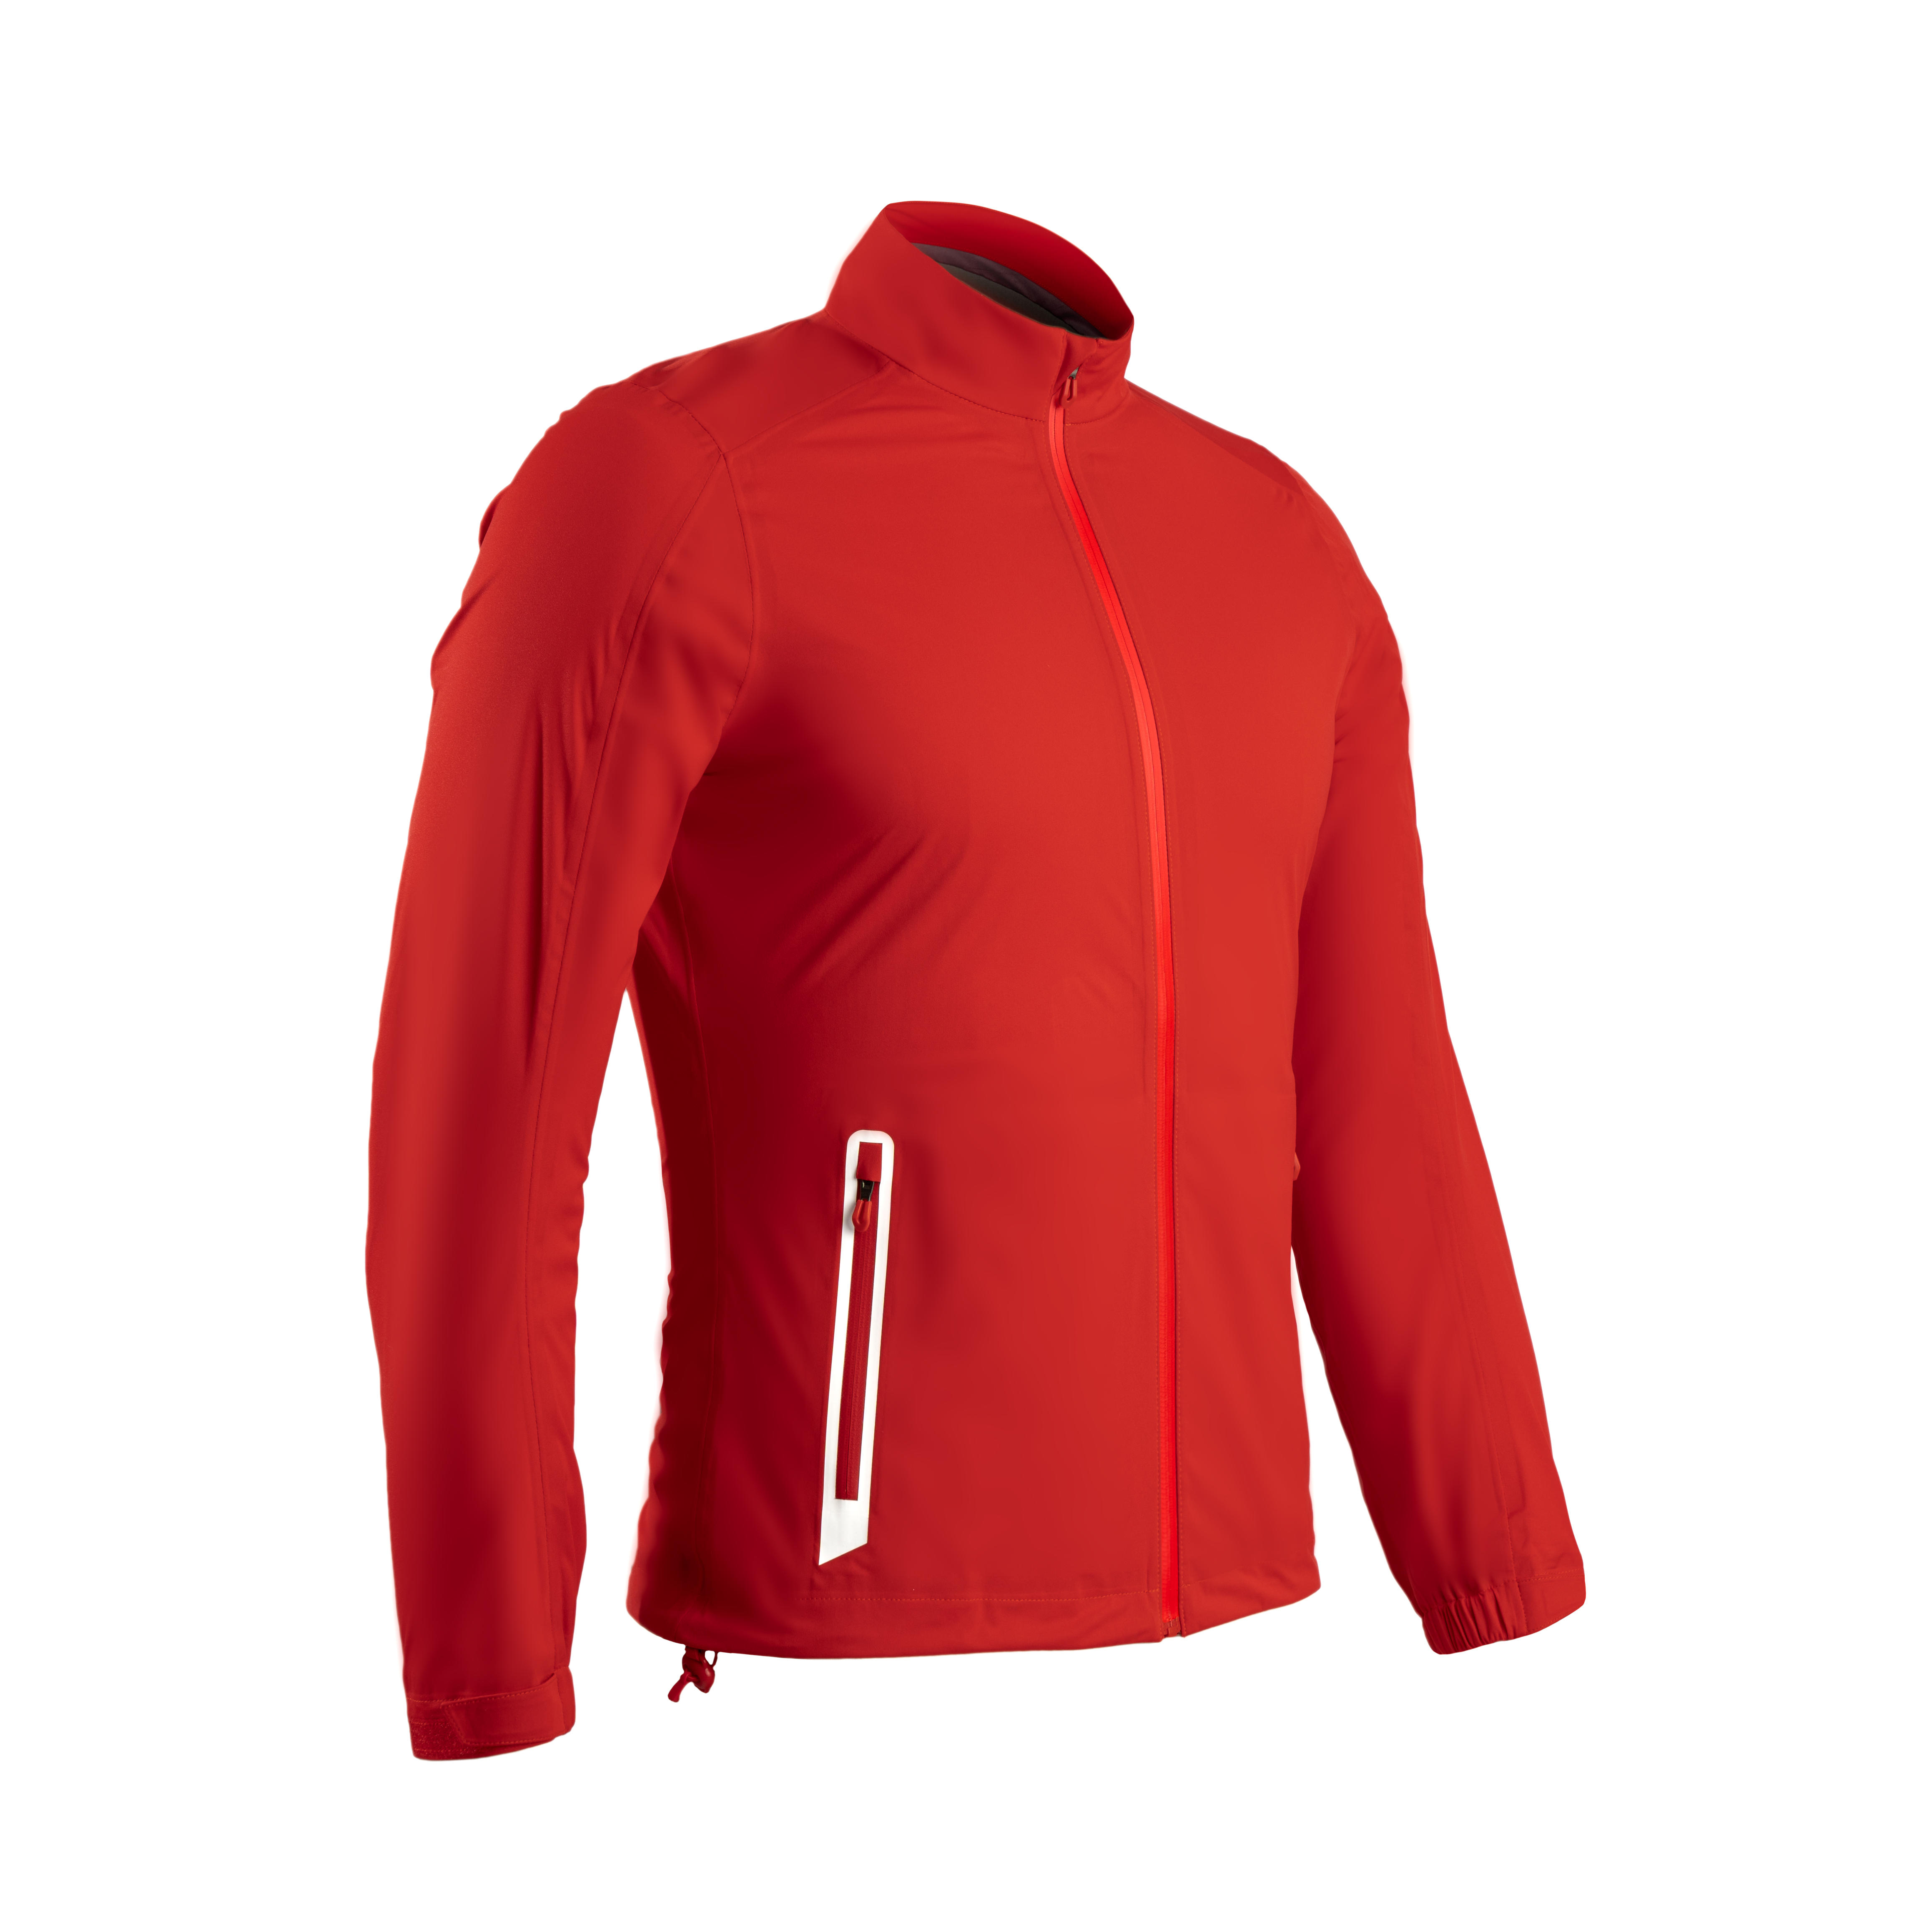 Jachetă Impermeabilă Golf imagine